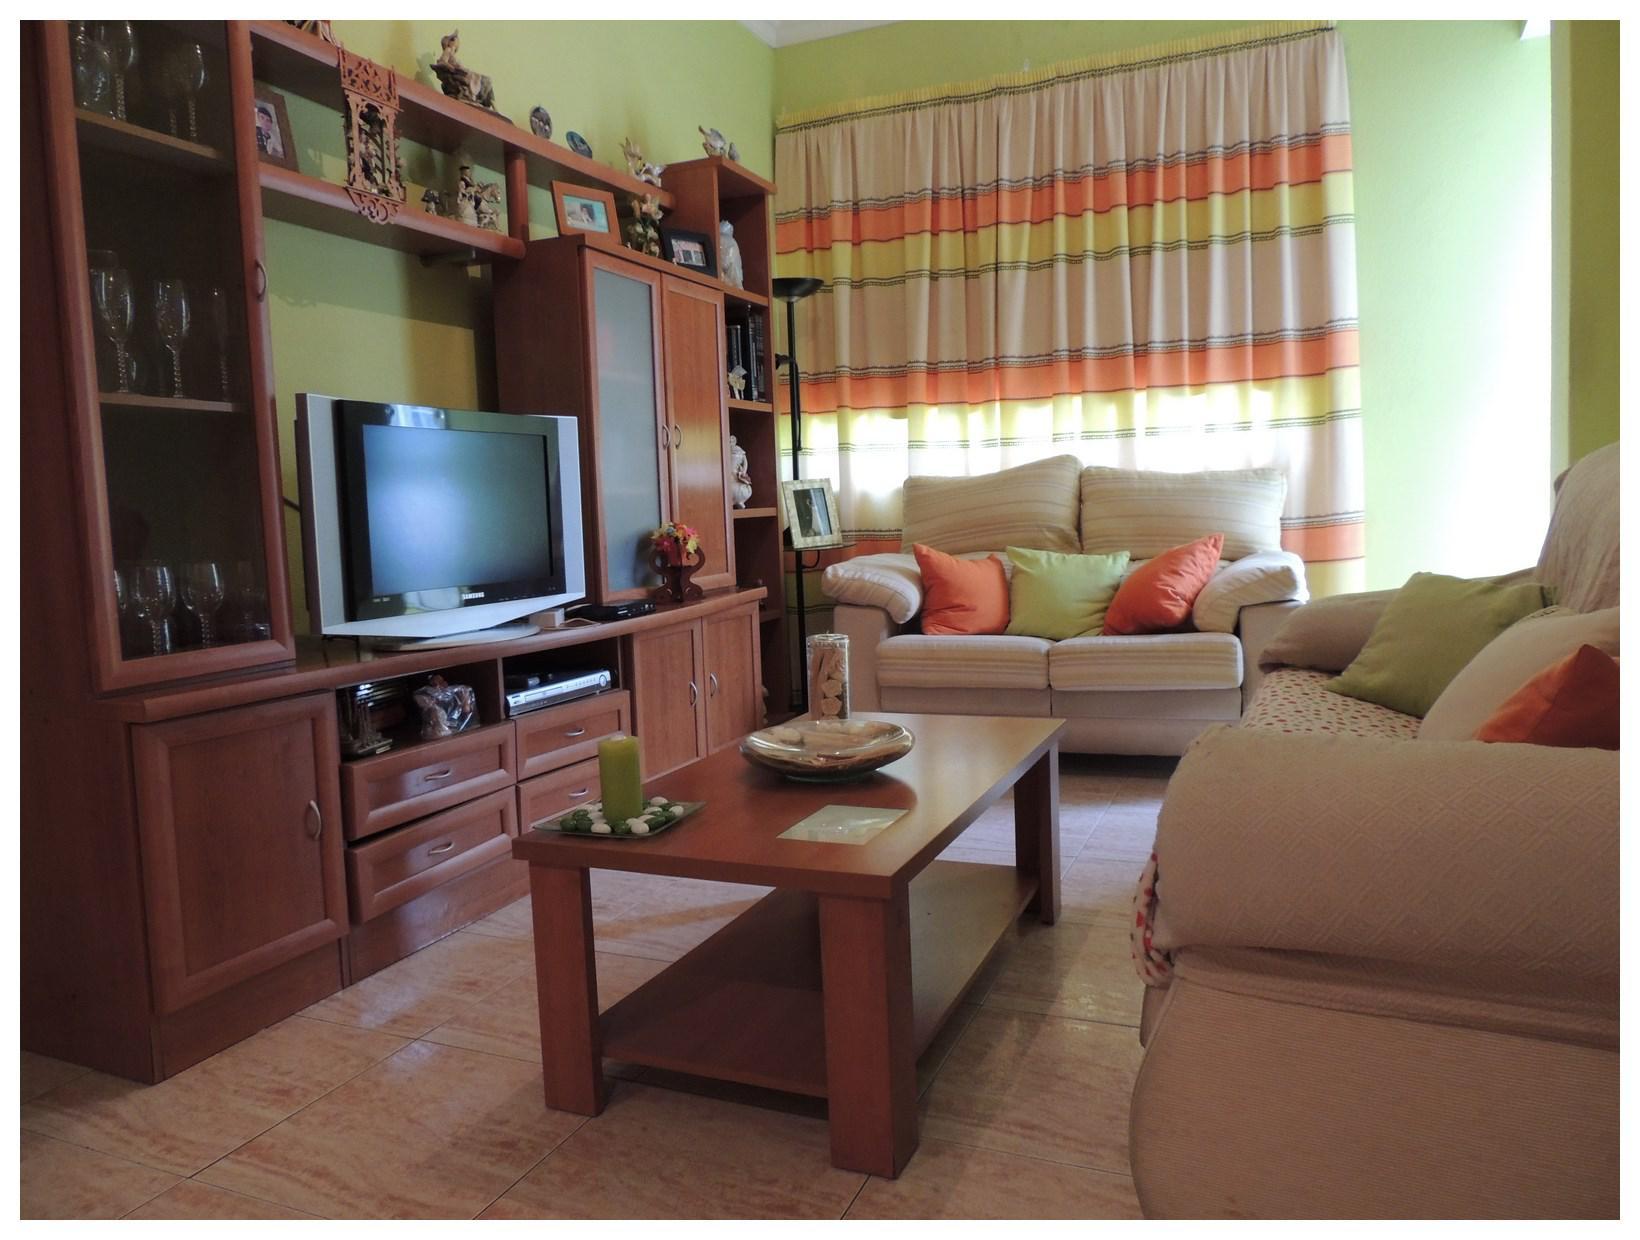 164694 - Estupendo piso en la Schamann, junto a Pedro Infinito.